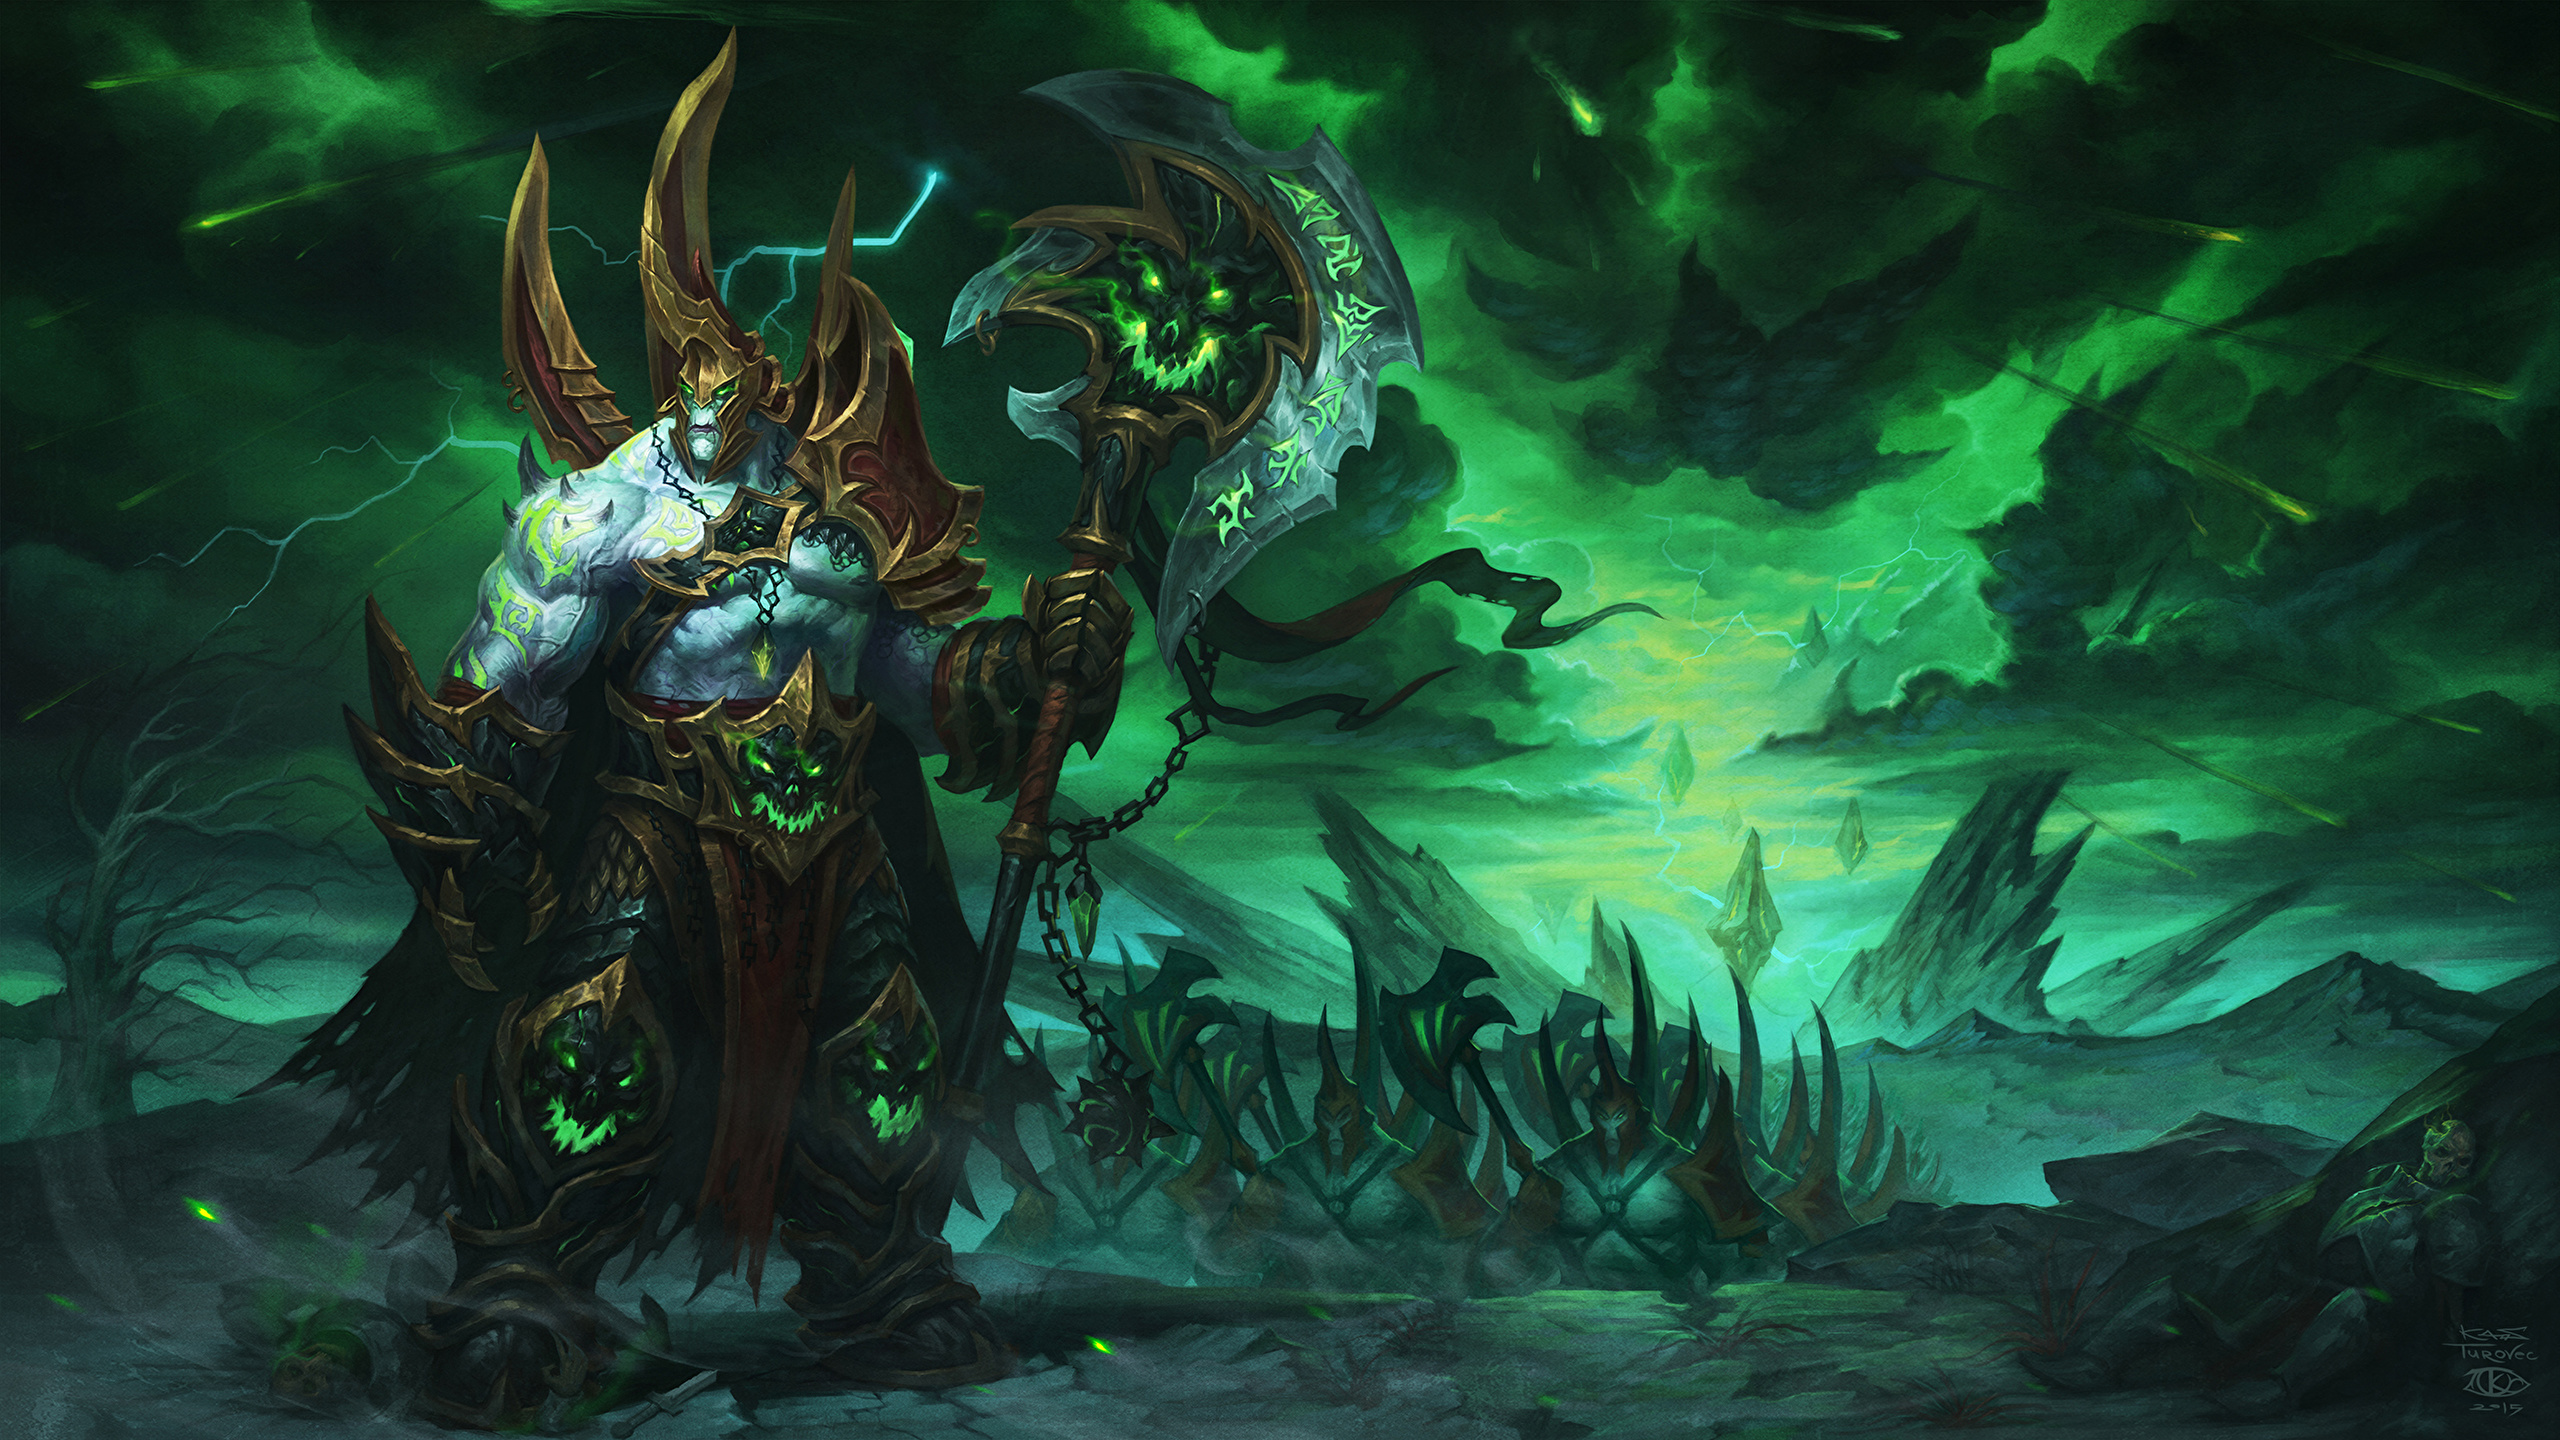 Photo World Of Warcraft Armor Shaman Mage Staff Warriors 2560x1440